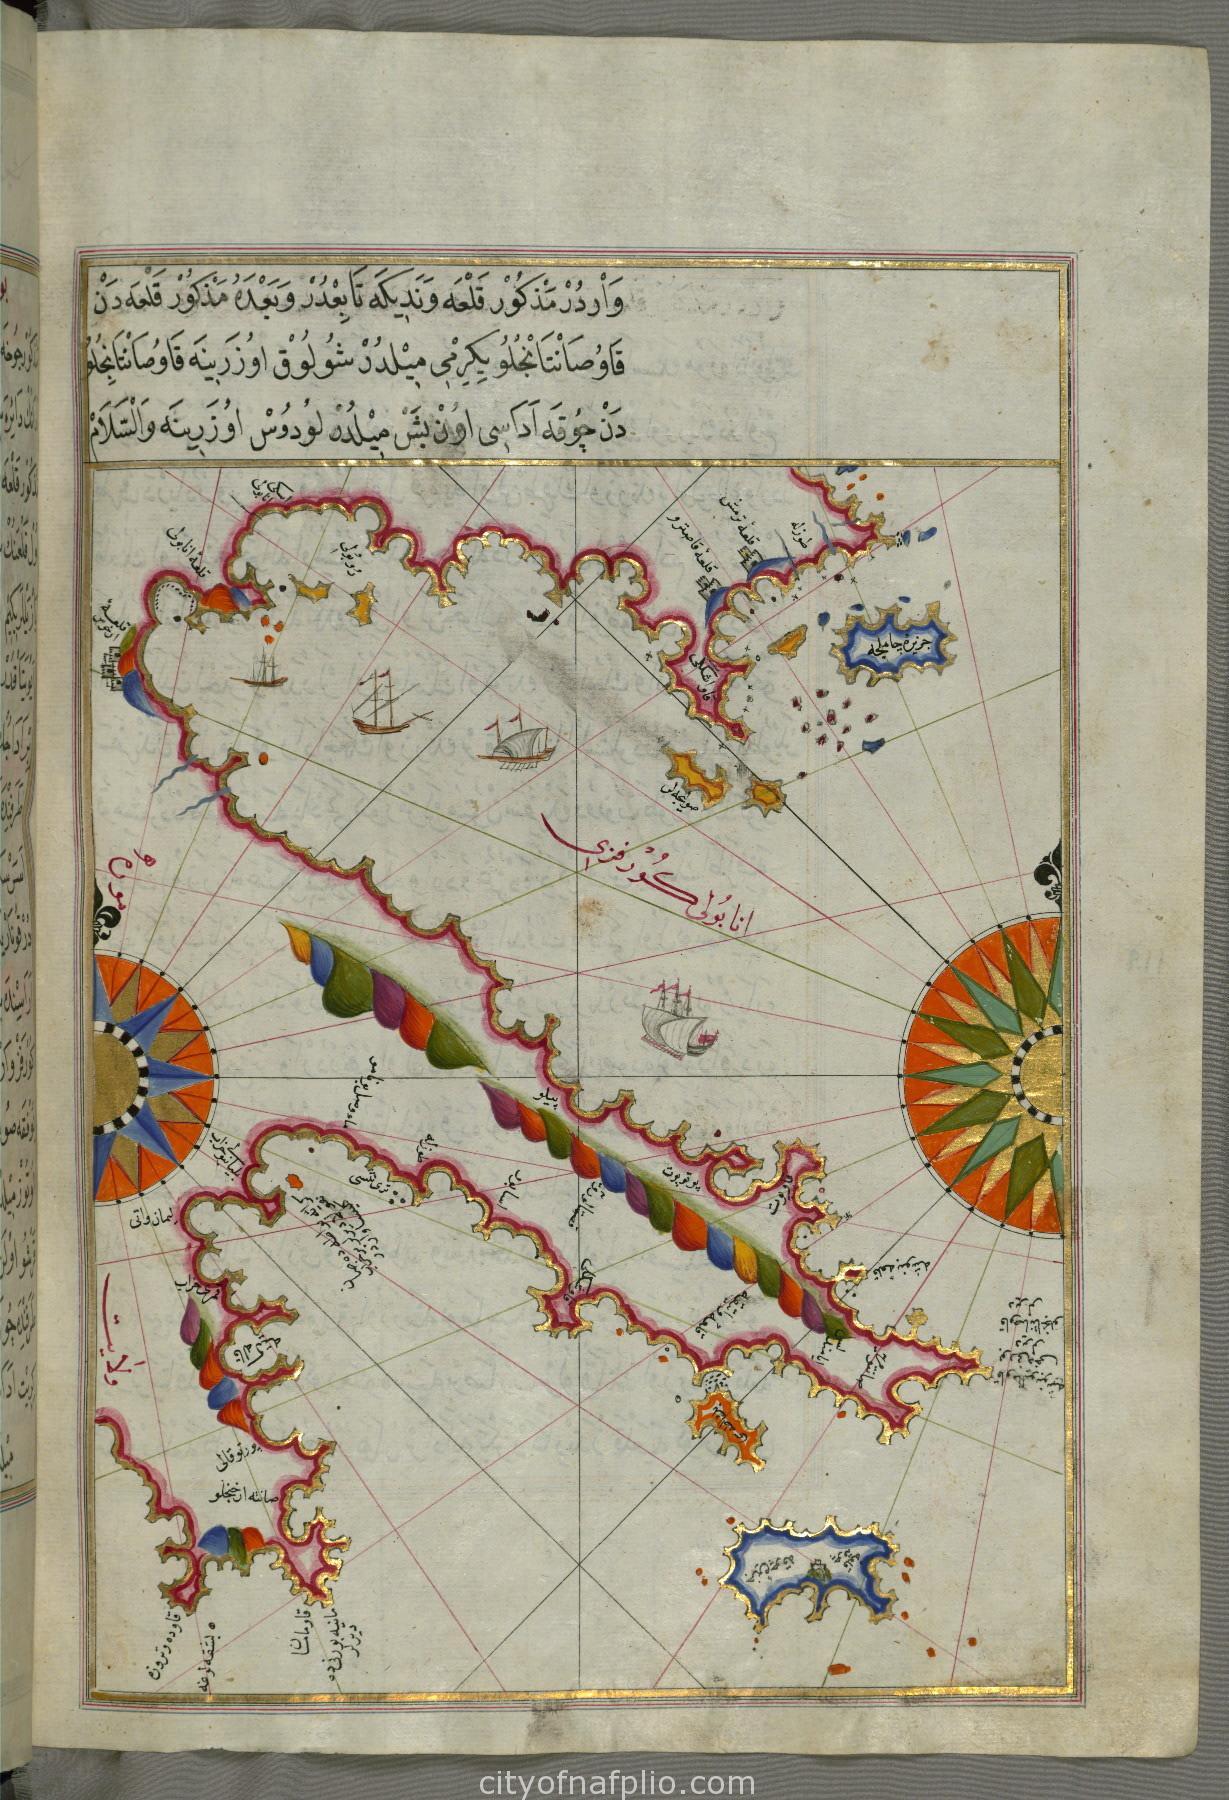 the Bay of Argolikos Anaboli and the Peloponneseby Piri Reis